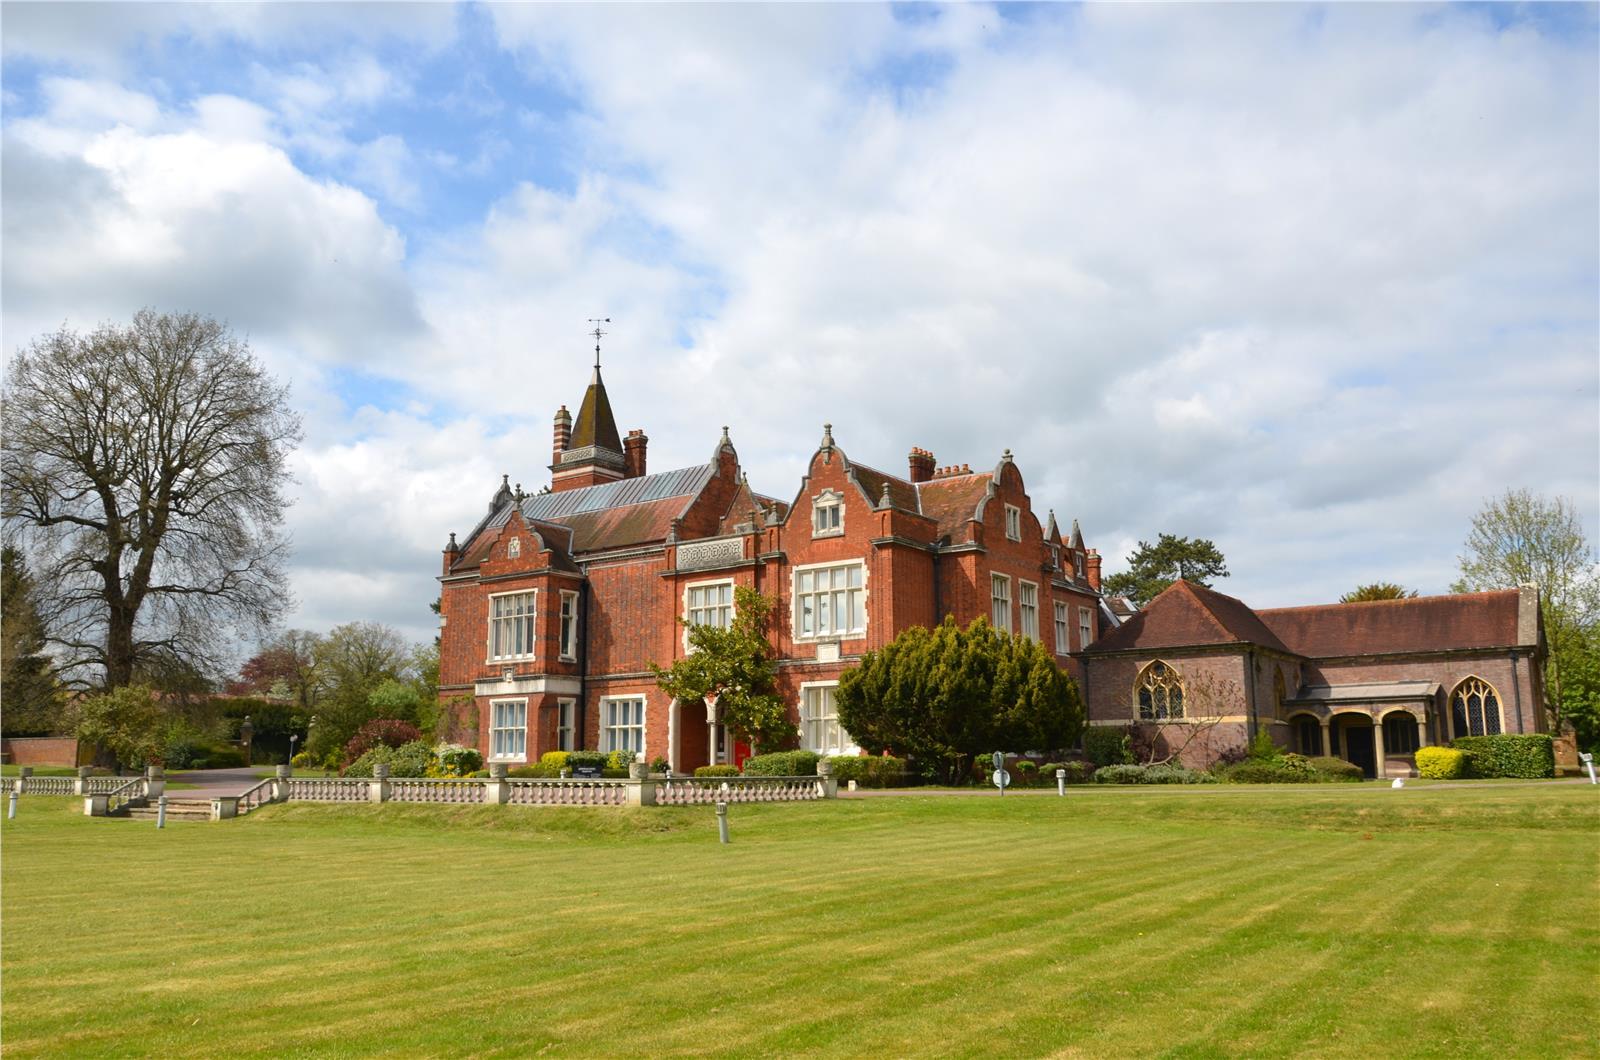 Grenville Court, Britwell Road, Burnham, Slough, Berkshire, SL1